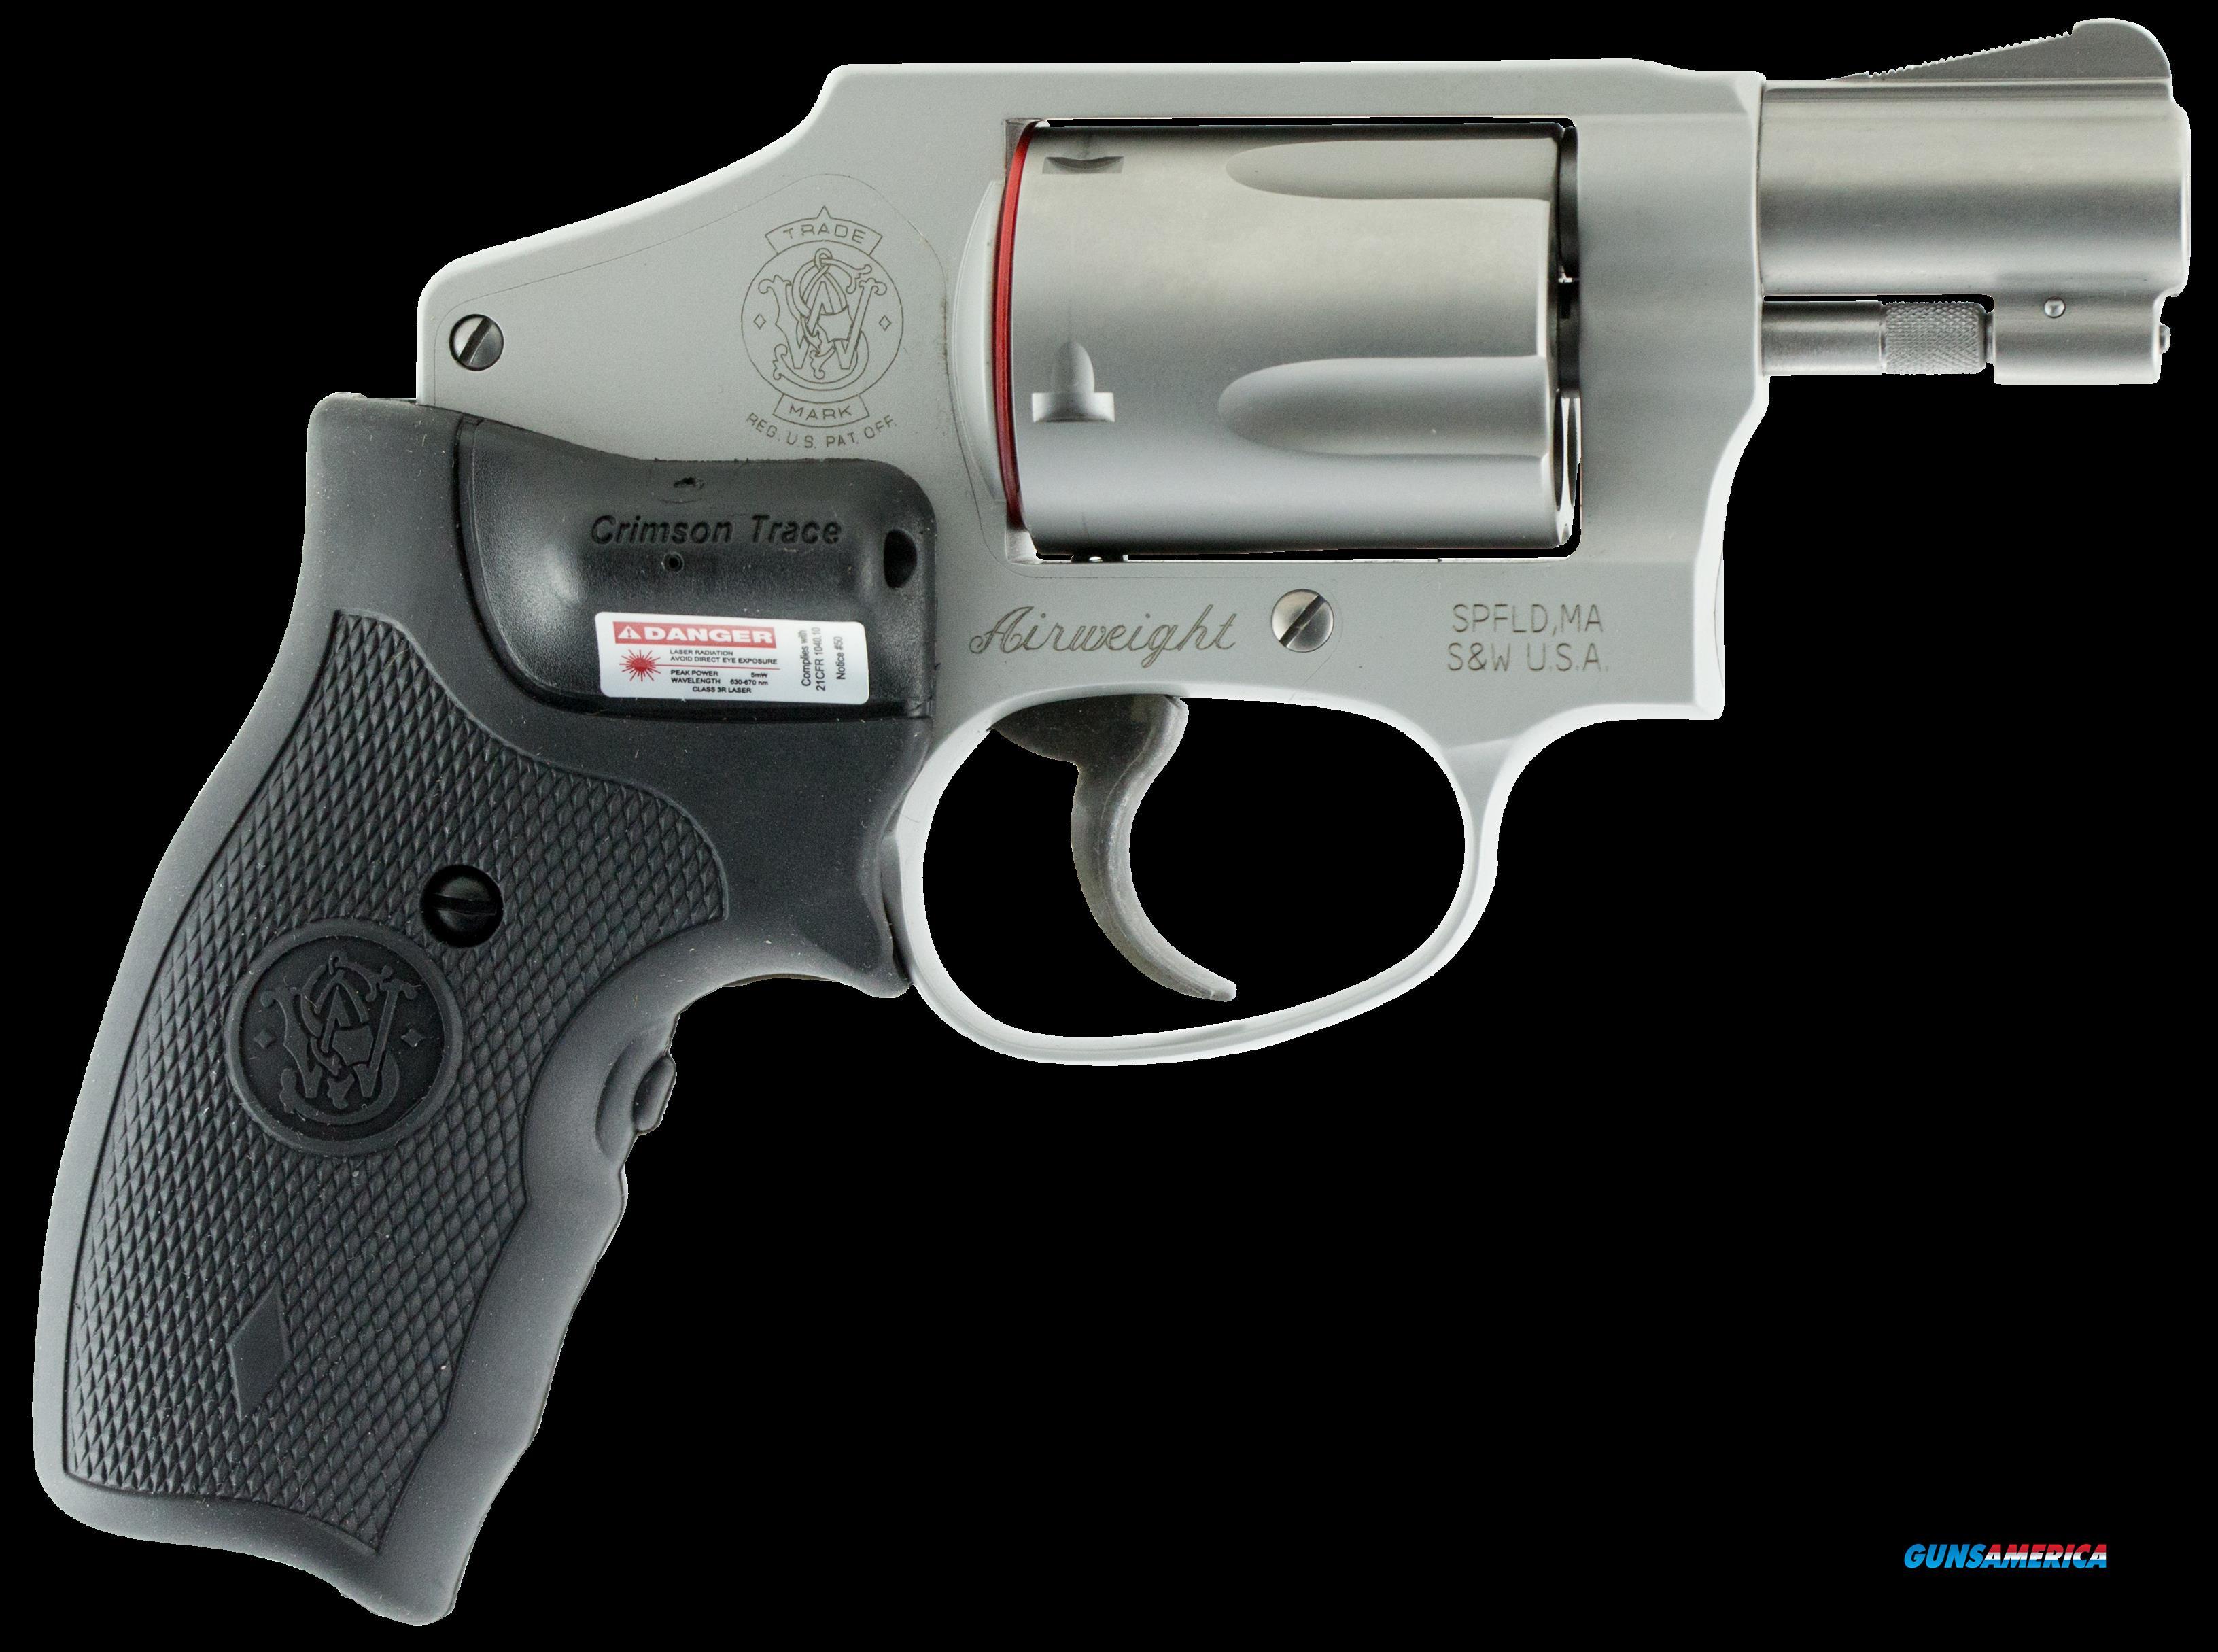 Smith & Wesson 642, S&w M642      150972 38  17-8 Ct Nolck  Ss  Guns > Pistols > 1911 Pistol Copies (non-Colt)